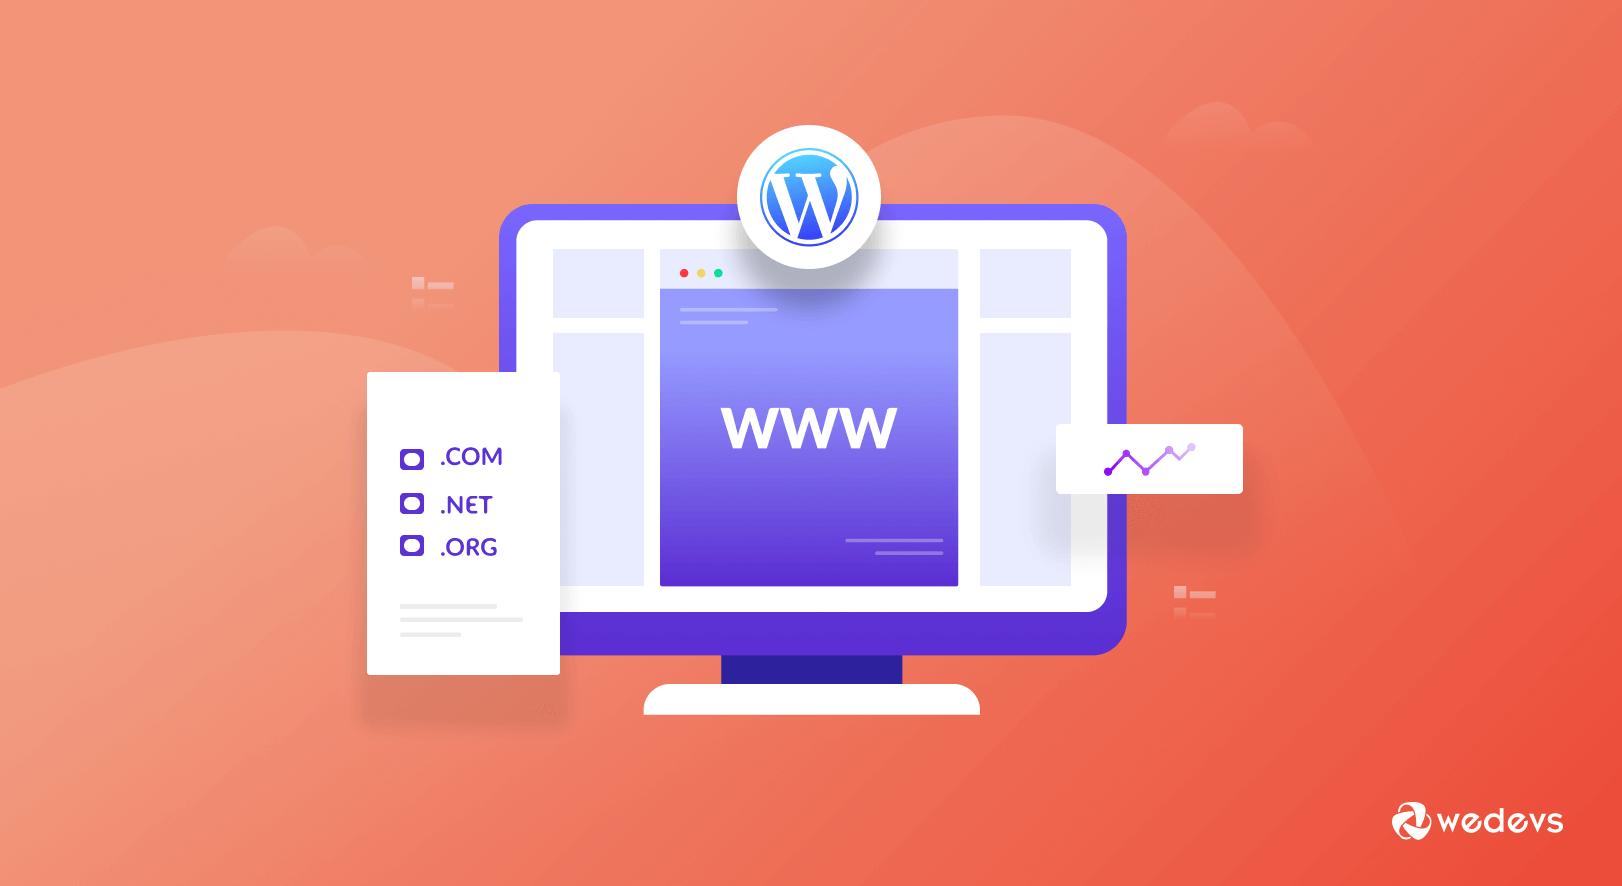 How to Improve Domain Authority of Your WordPress Website